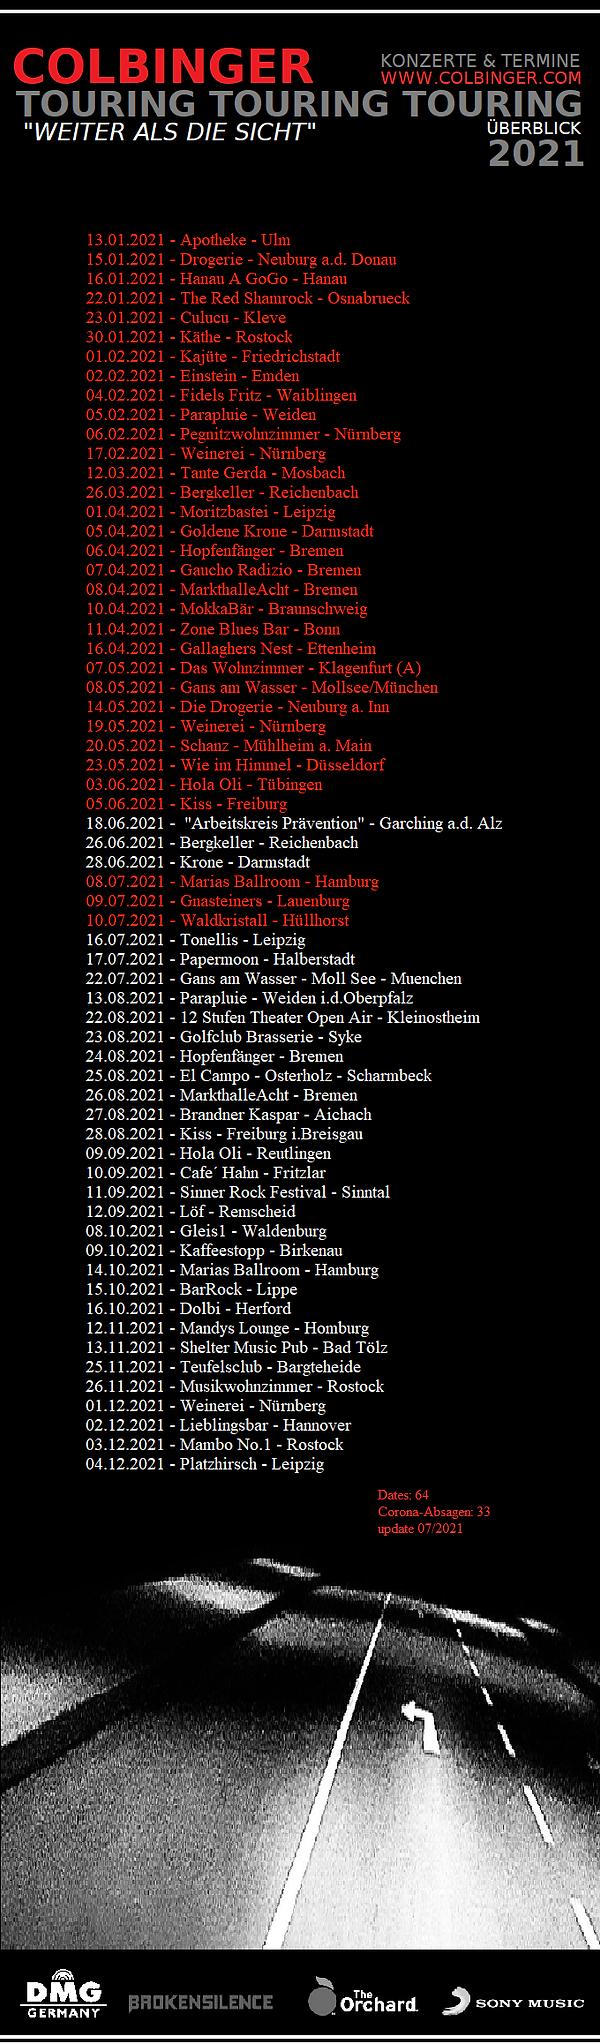 Colbinger Tour&Dates2021 Overview 7/2021